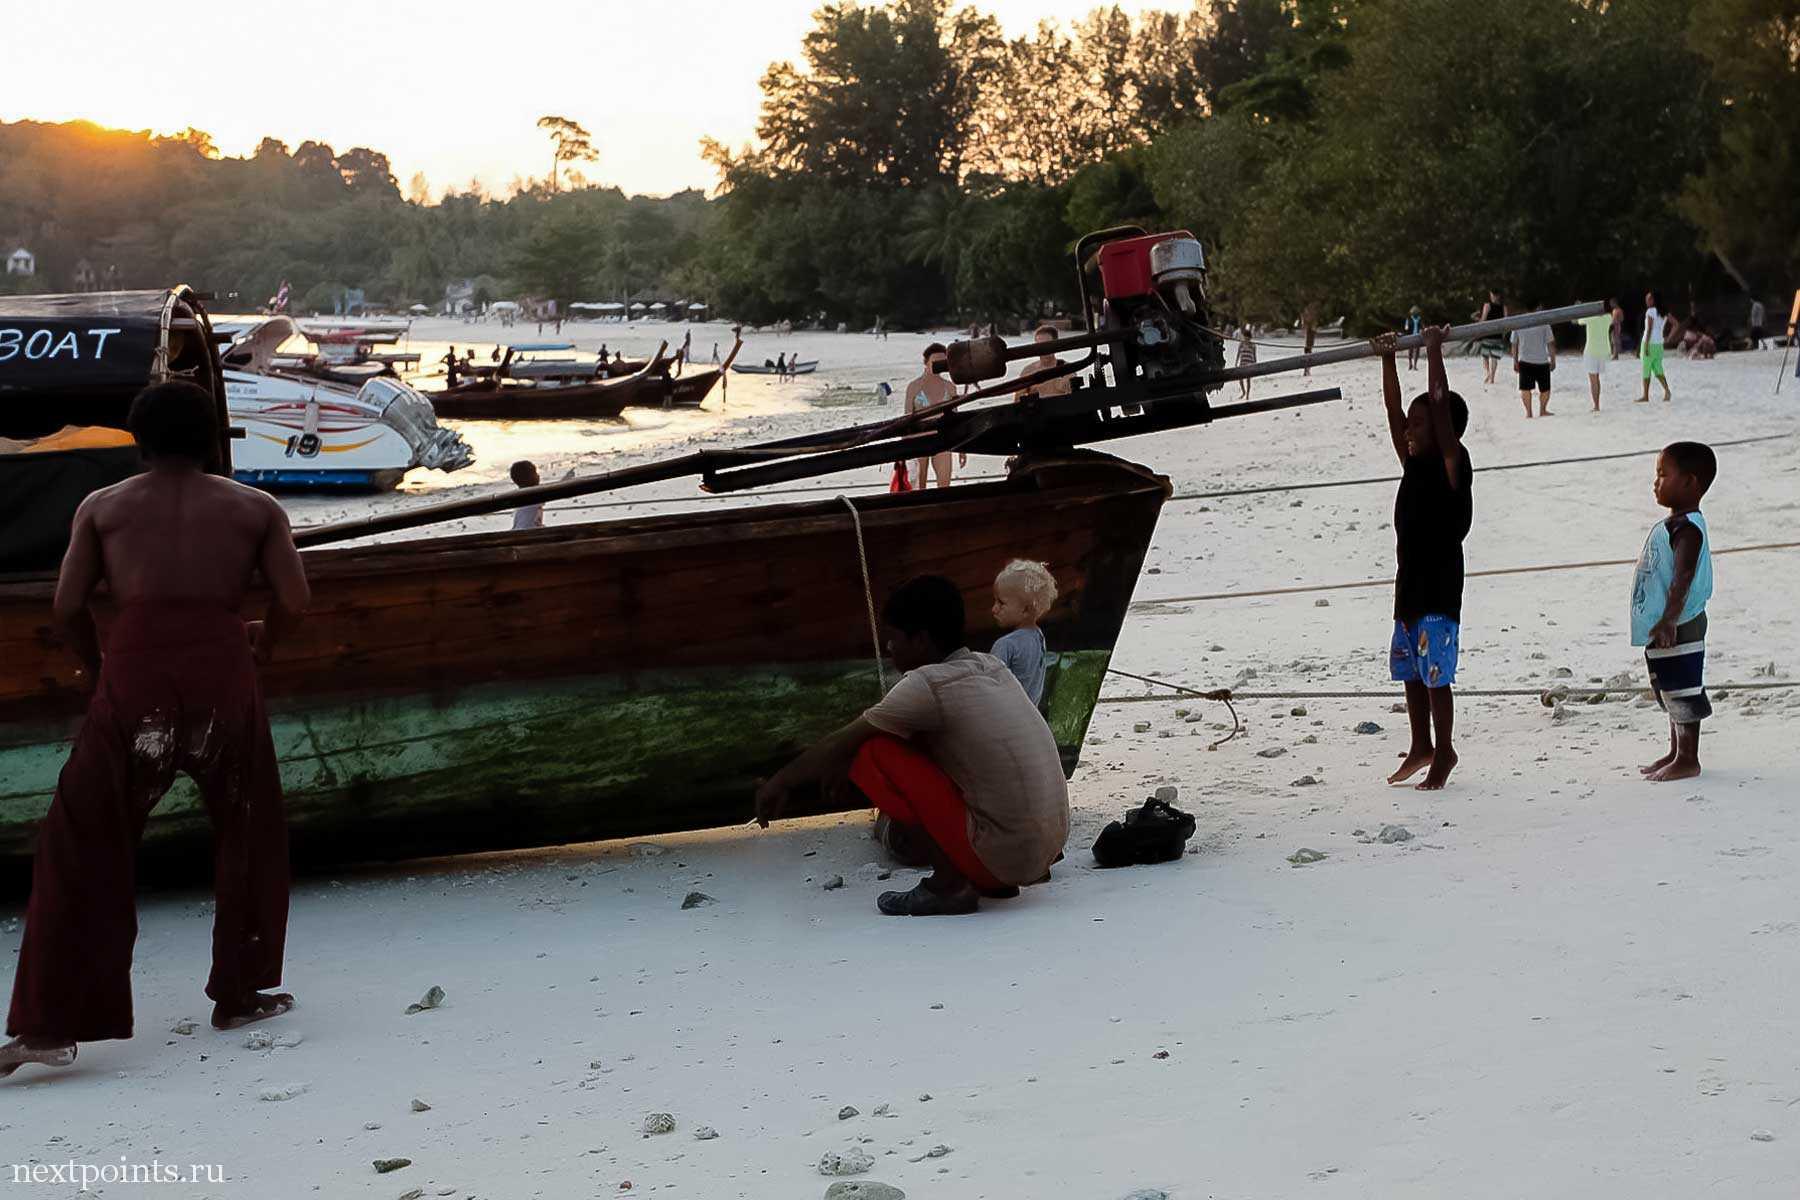 Рыбаки вынимают лодку вечером на Ко Липе